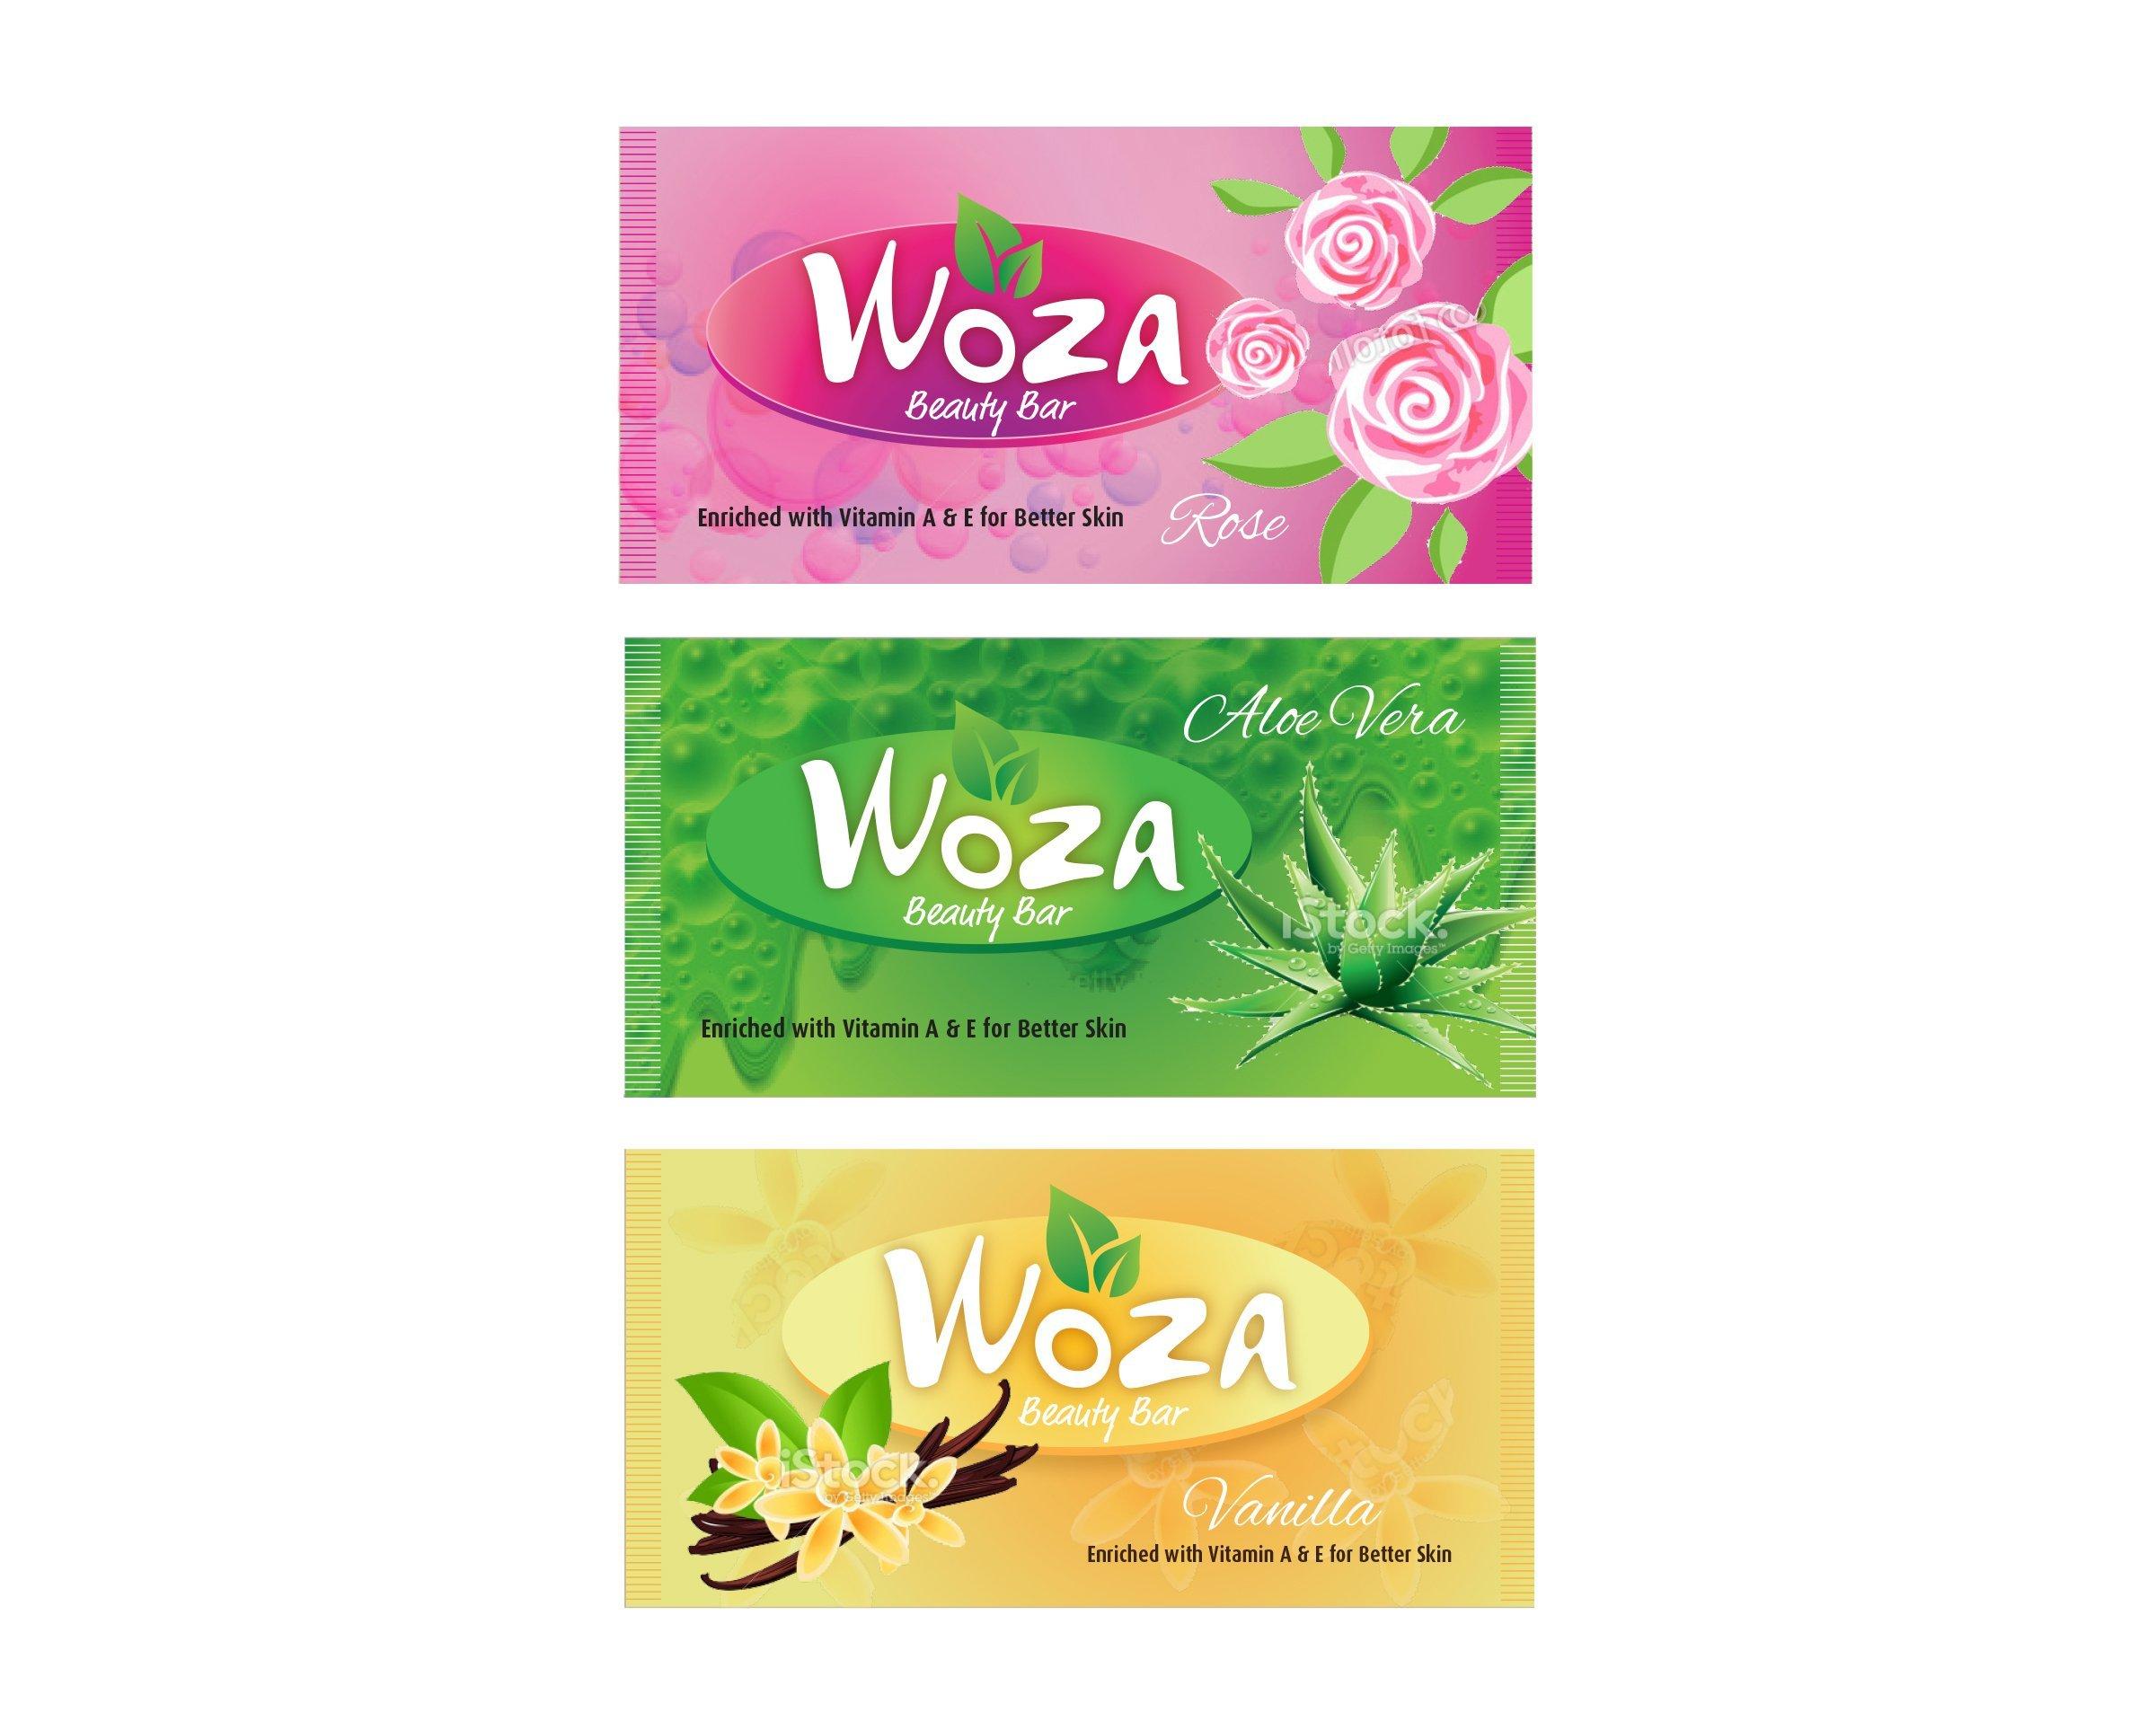 design for soap